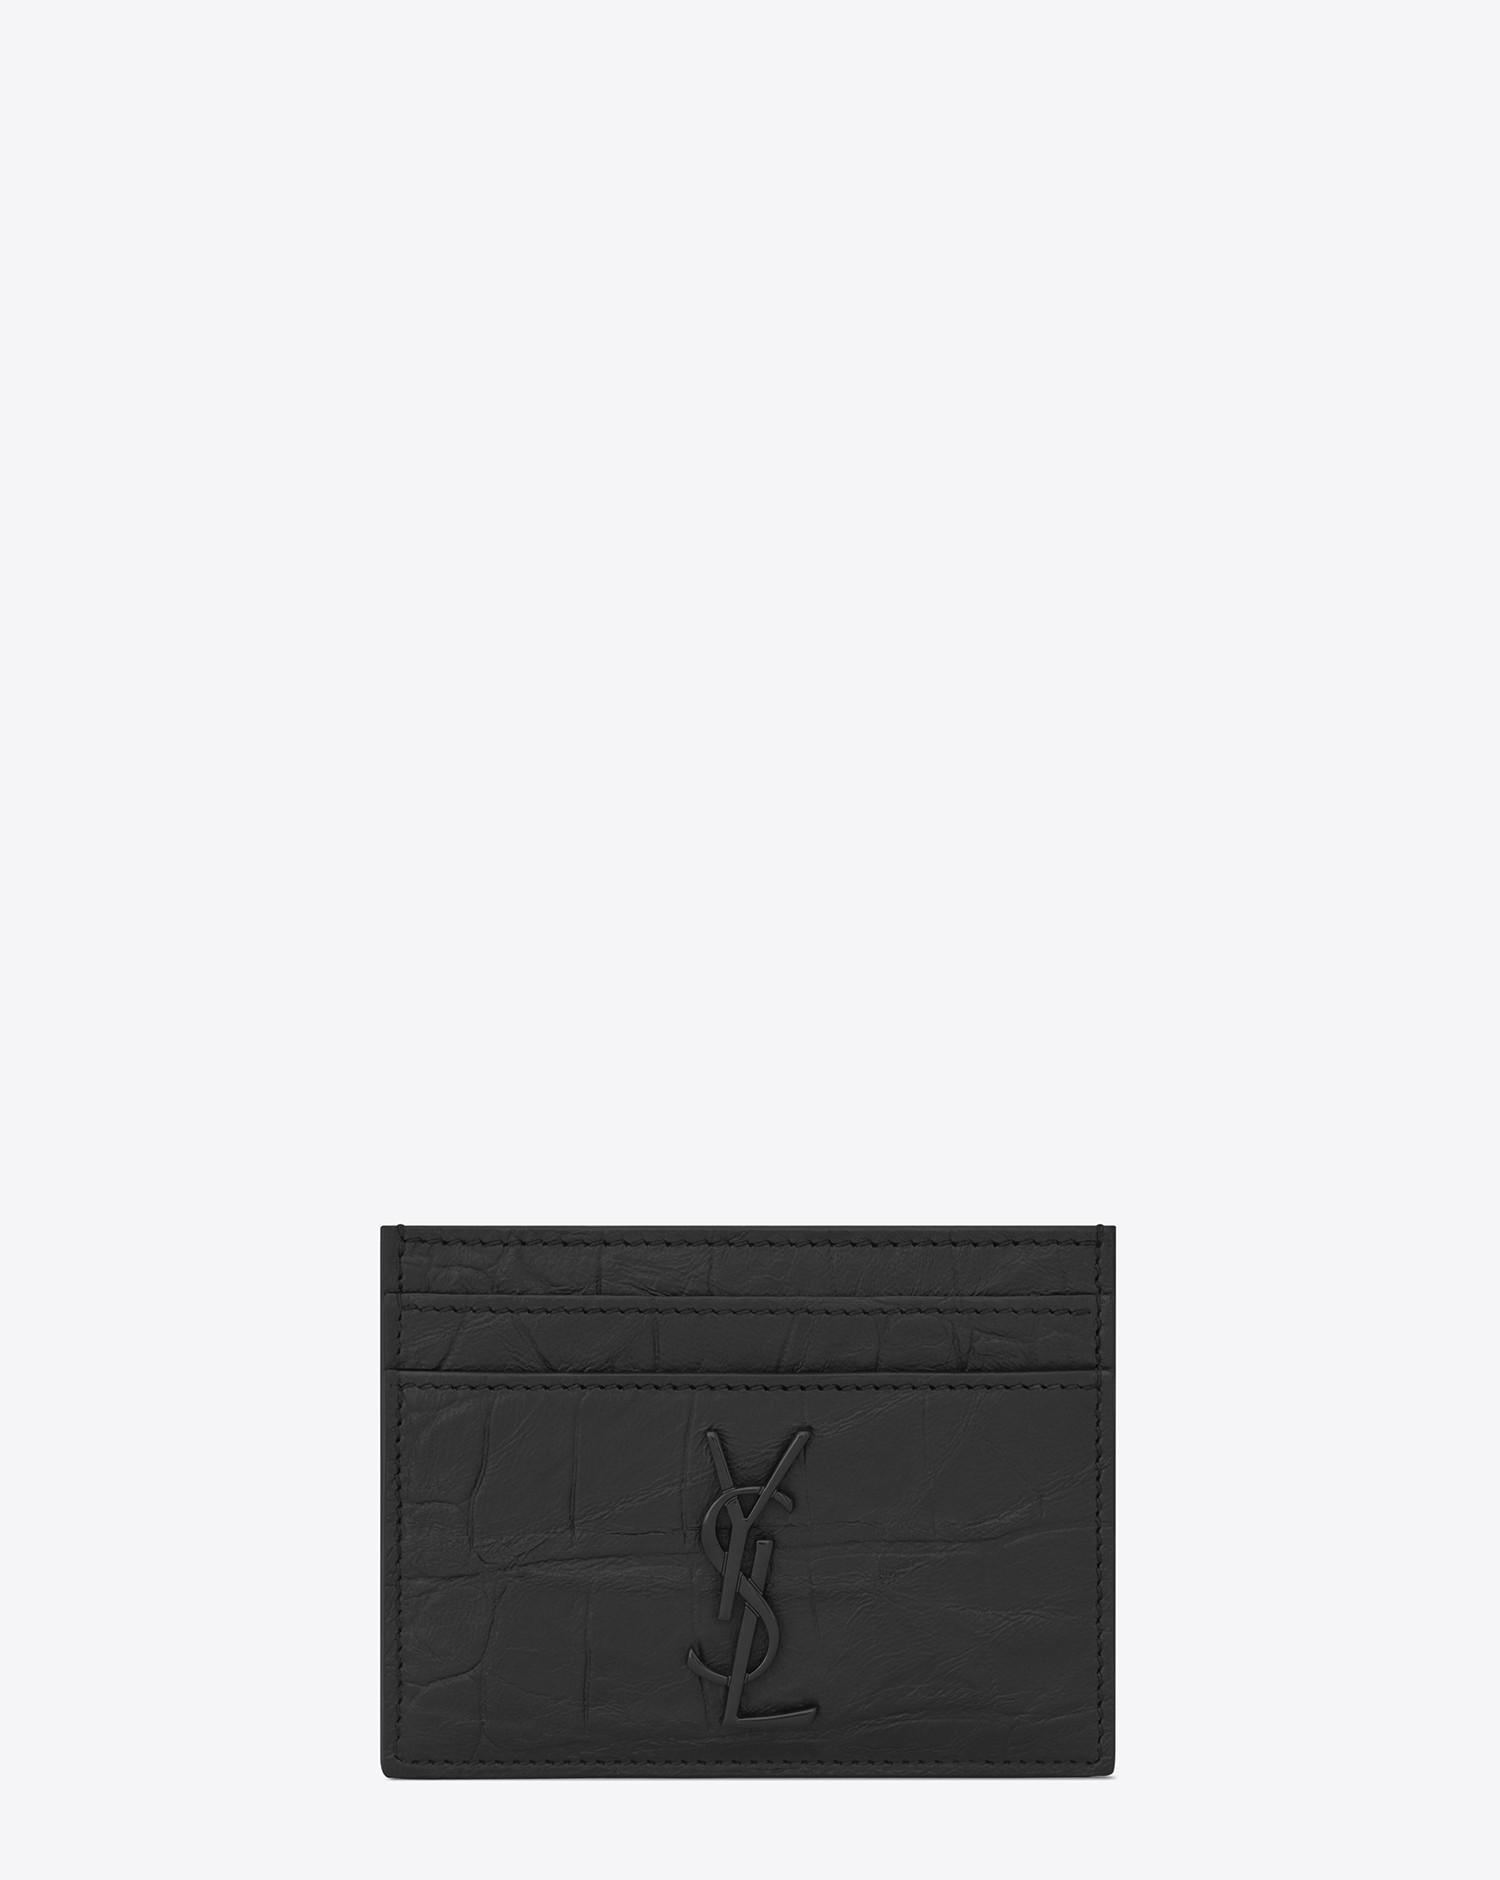 33a230037f1b Saint Laurent. Men s Black Monogram Card Case In Crocodile Embossed Leather